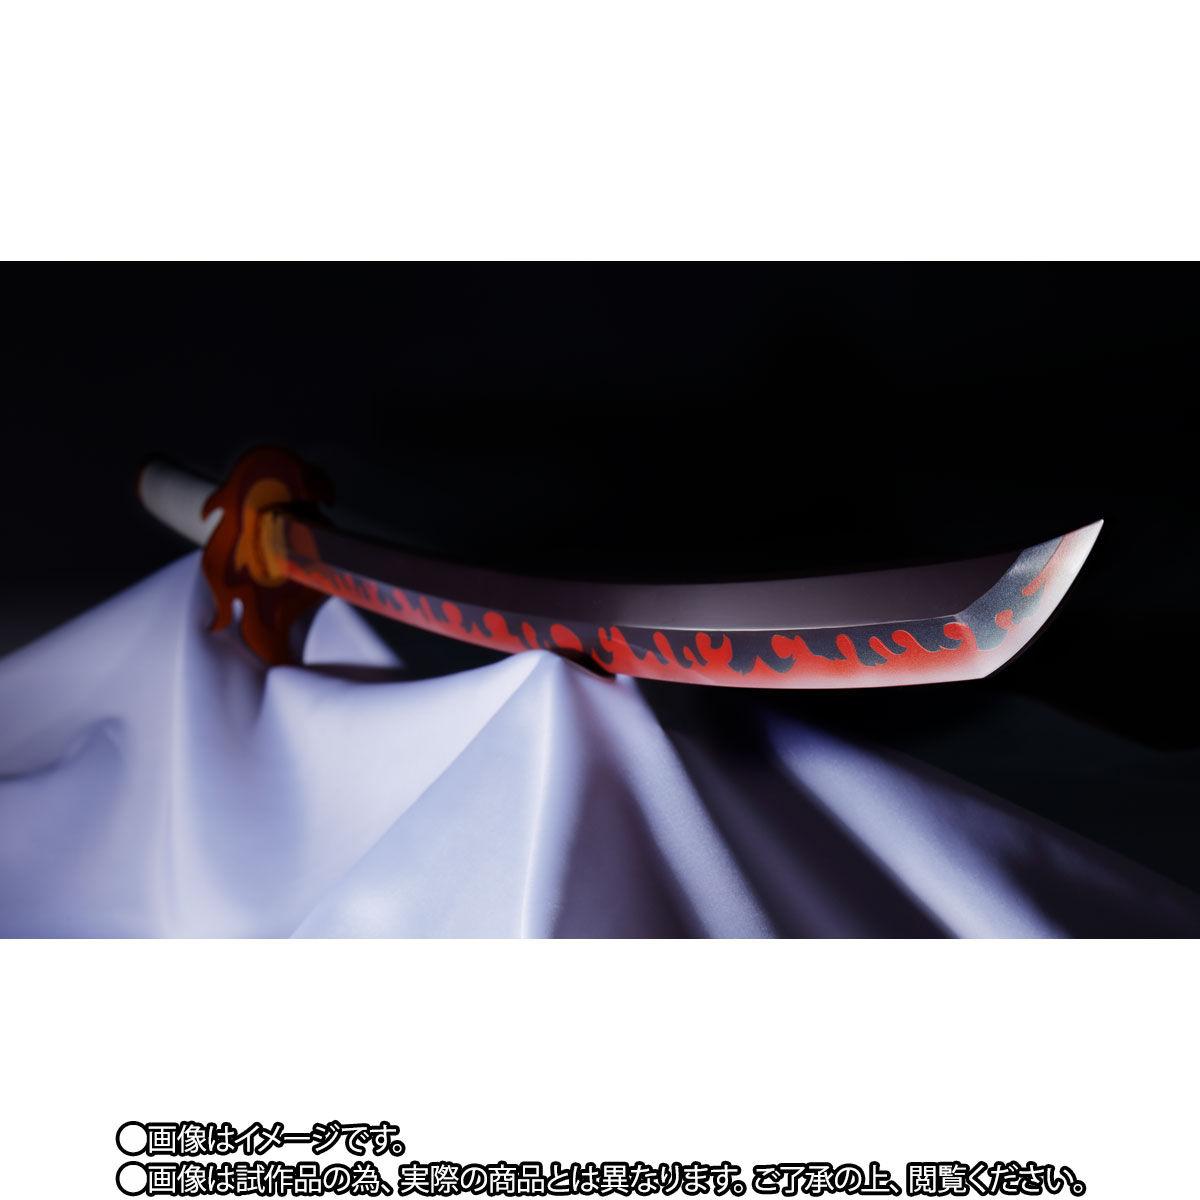 PROPLICA プロップリカ『日輪刀(煉獄杏寿郎)』鬼滅の刃 変身なりきり-006